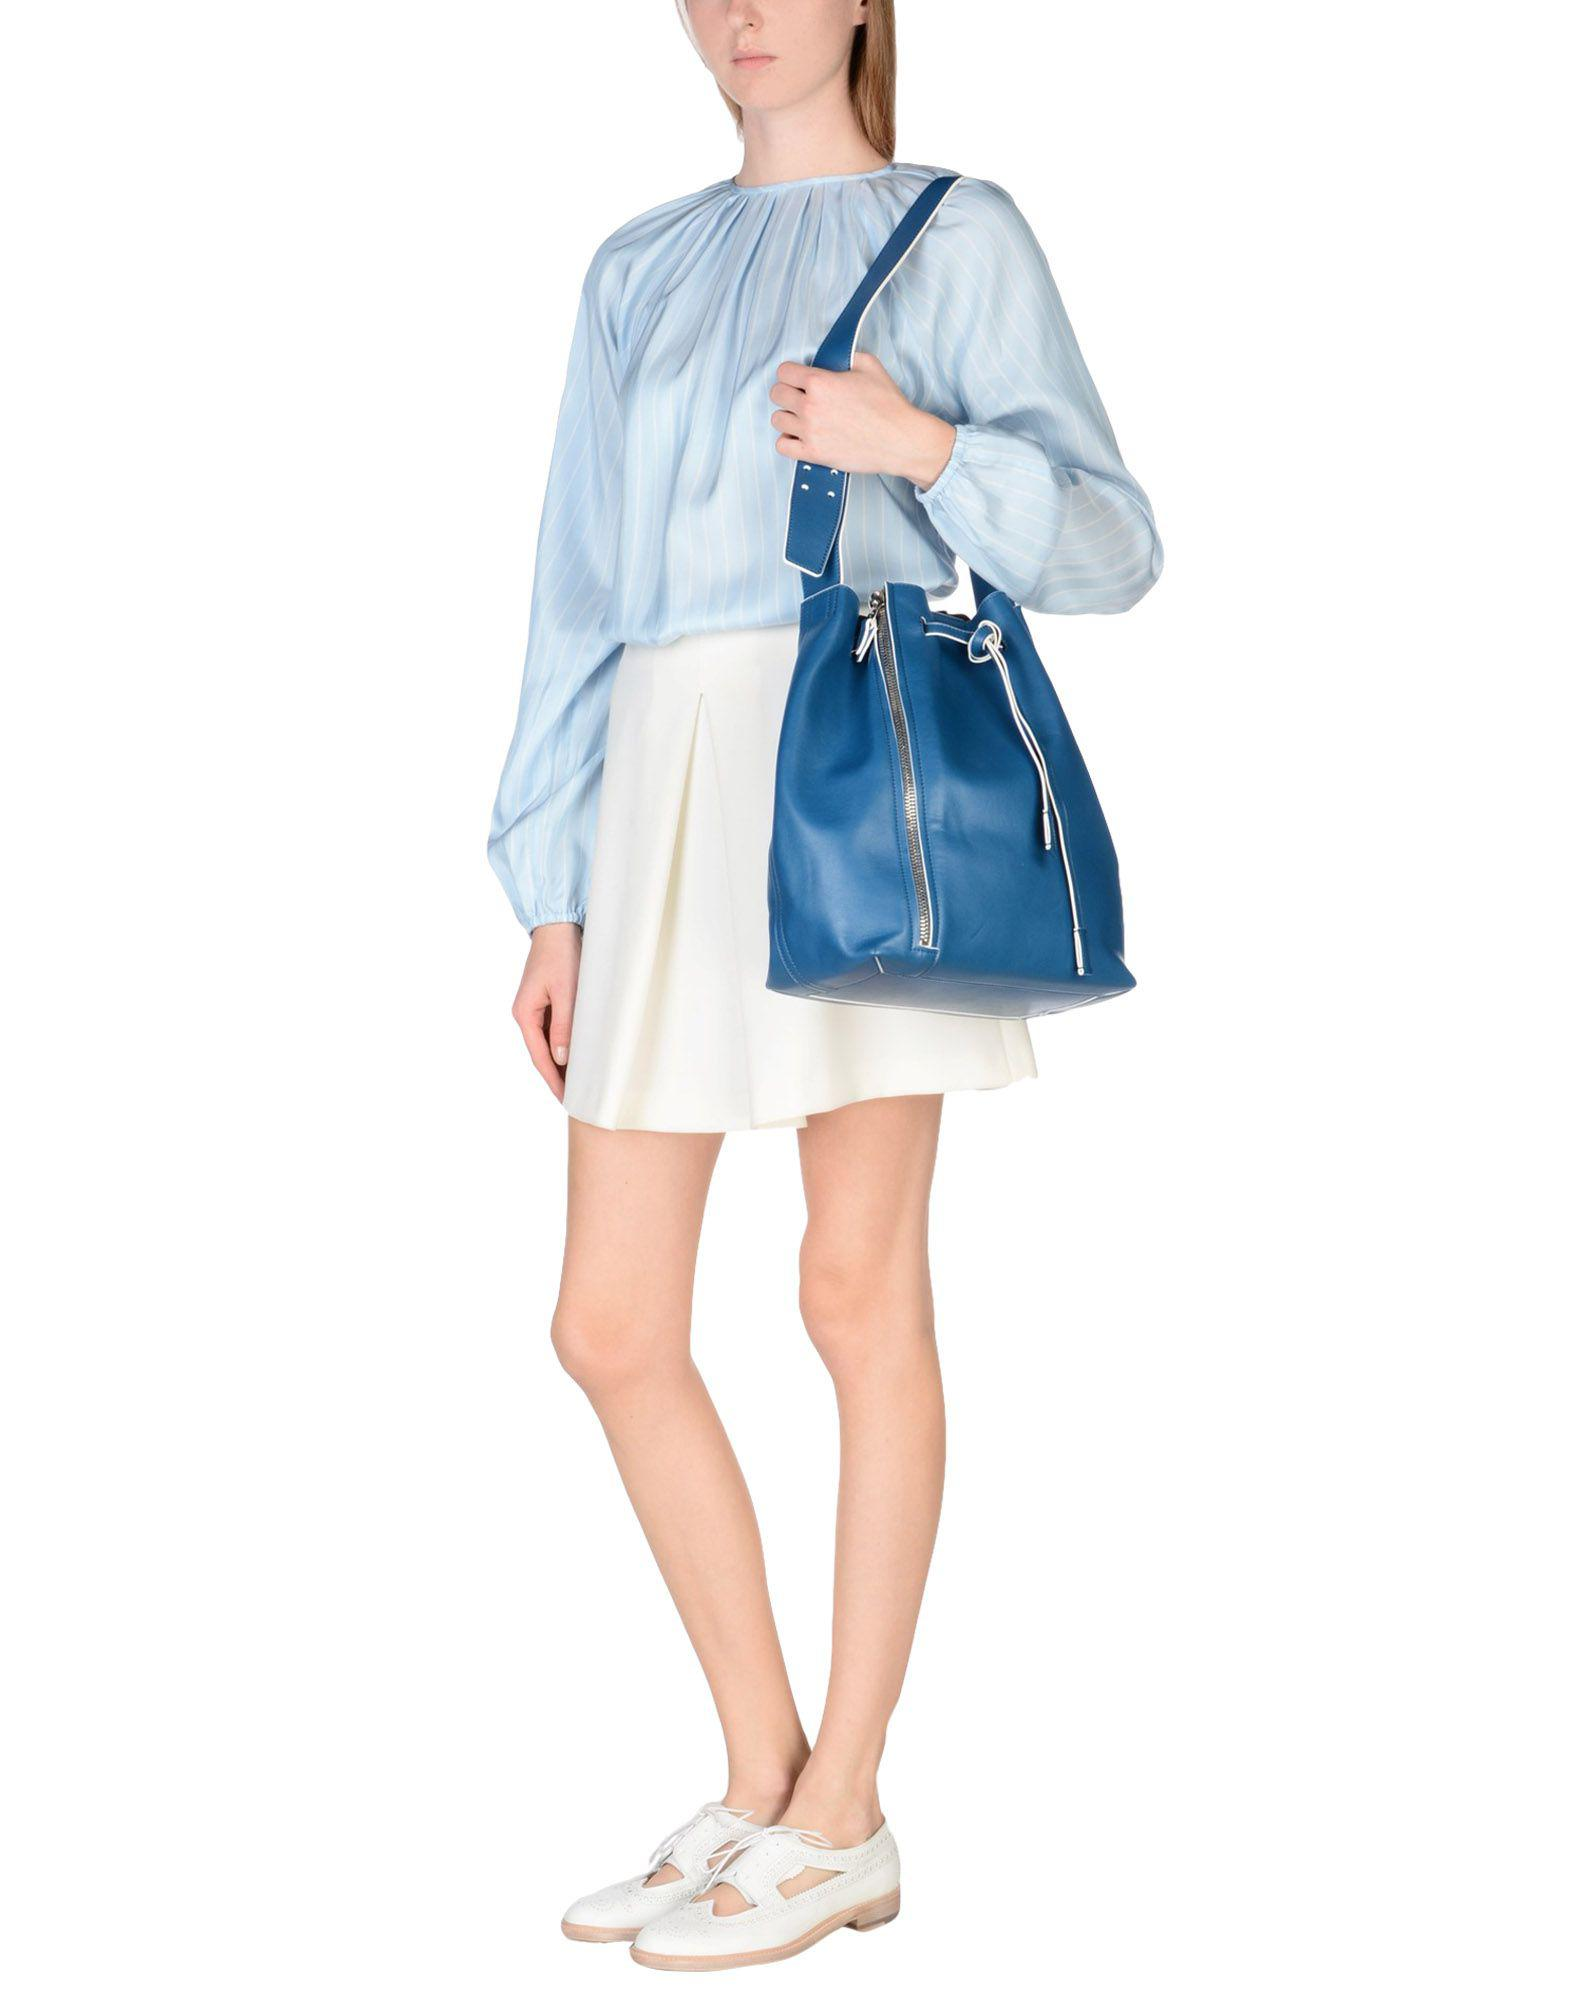 Elena Ghisellini Leather Cross-body Bag in Pastel Blue (Blue)